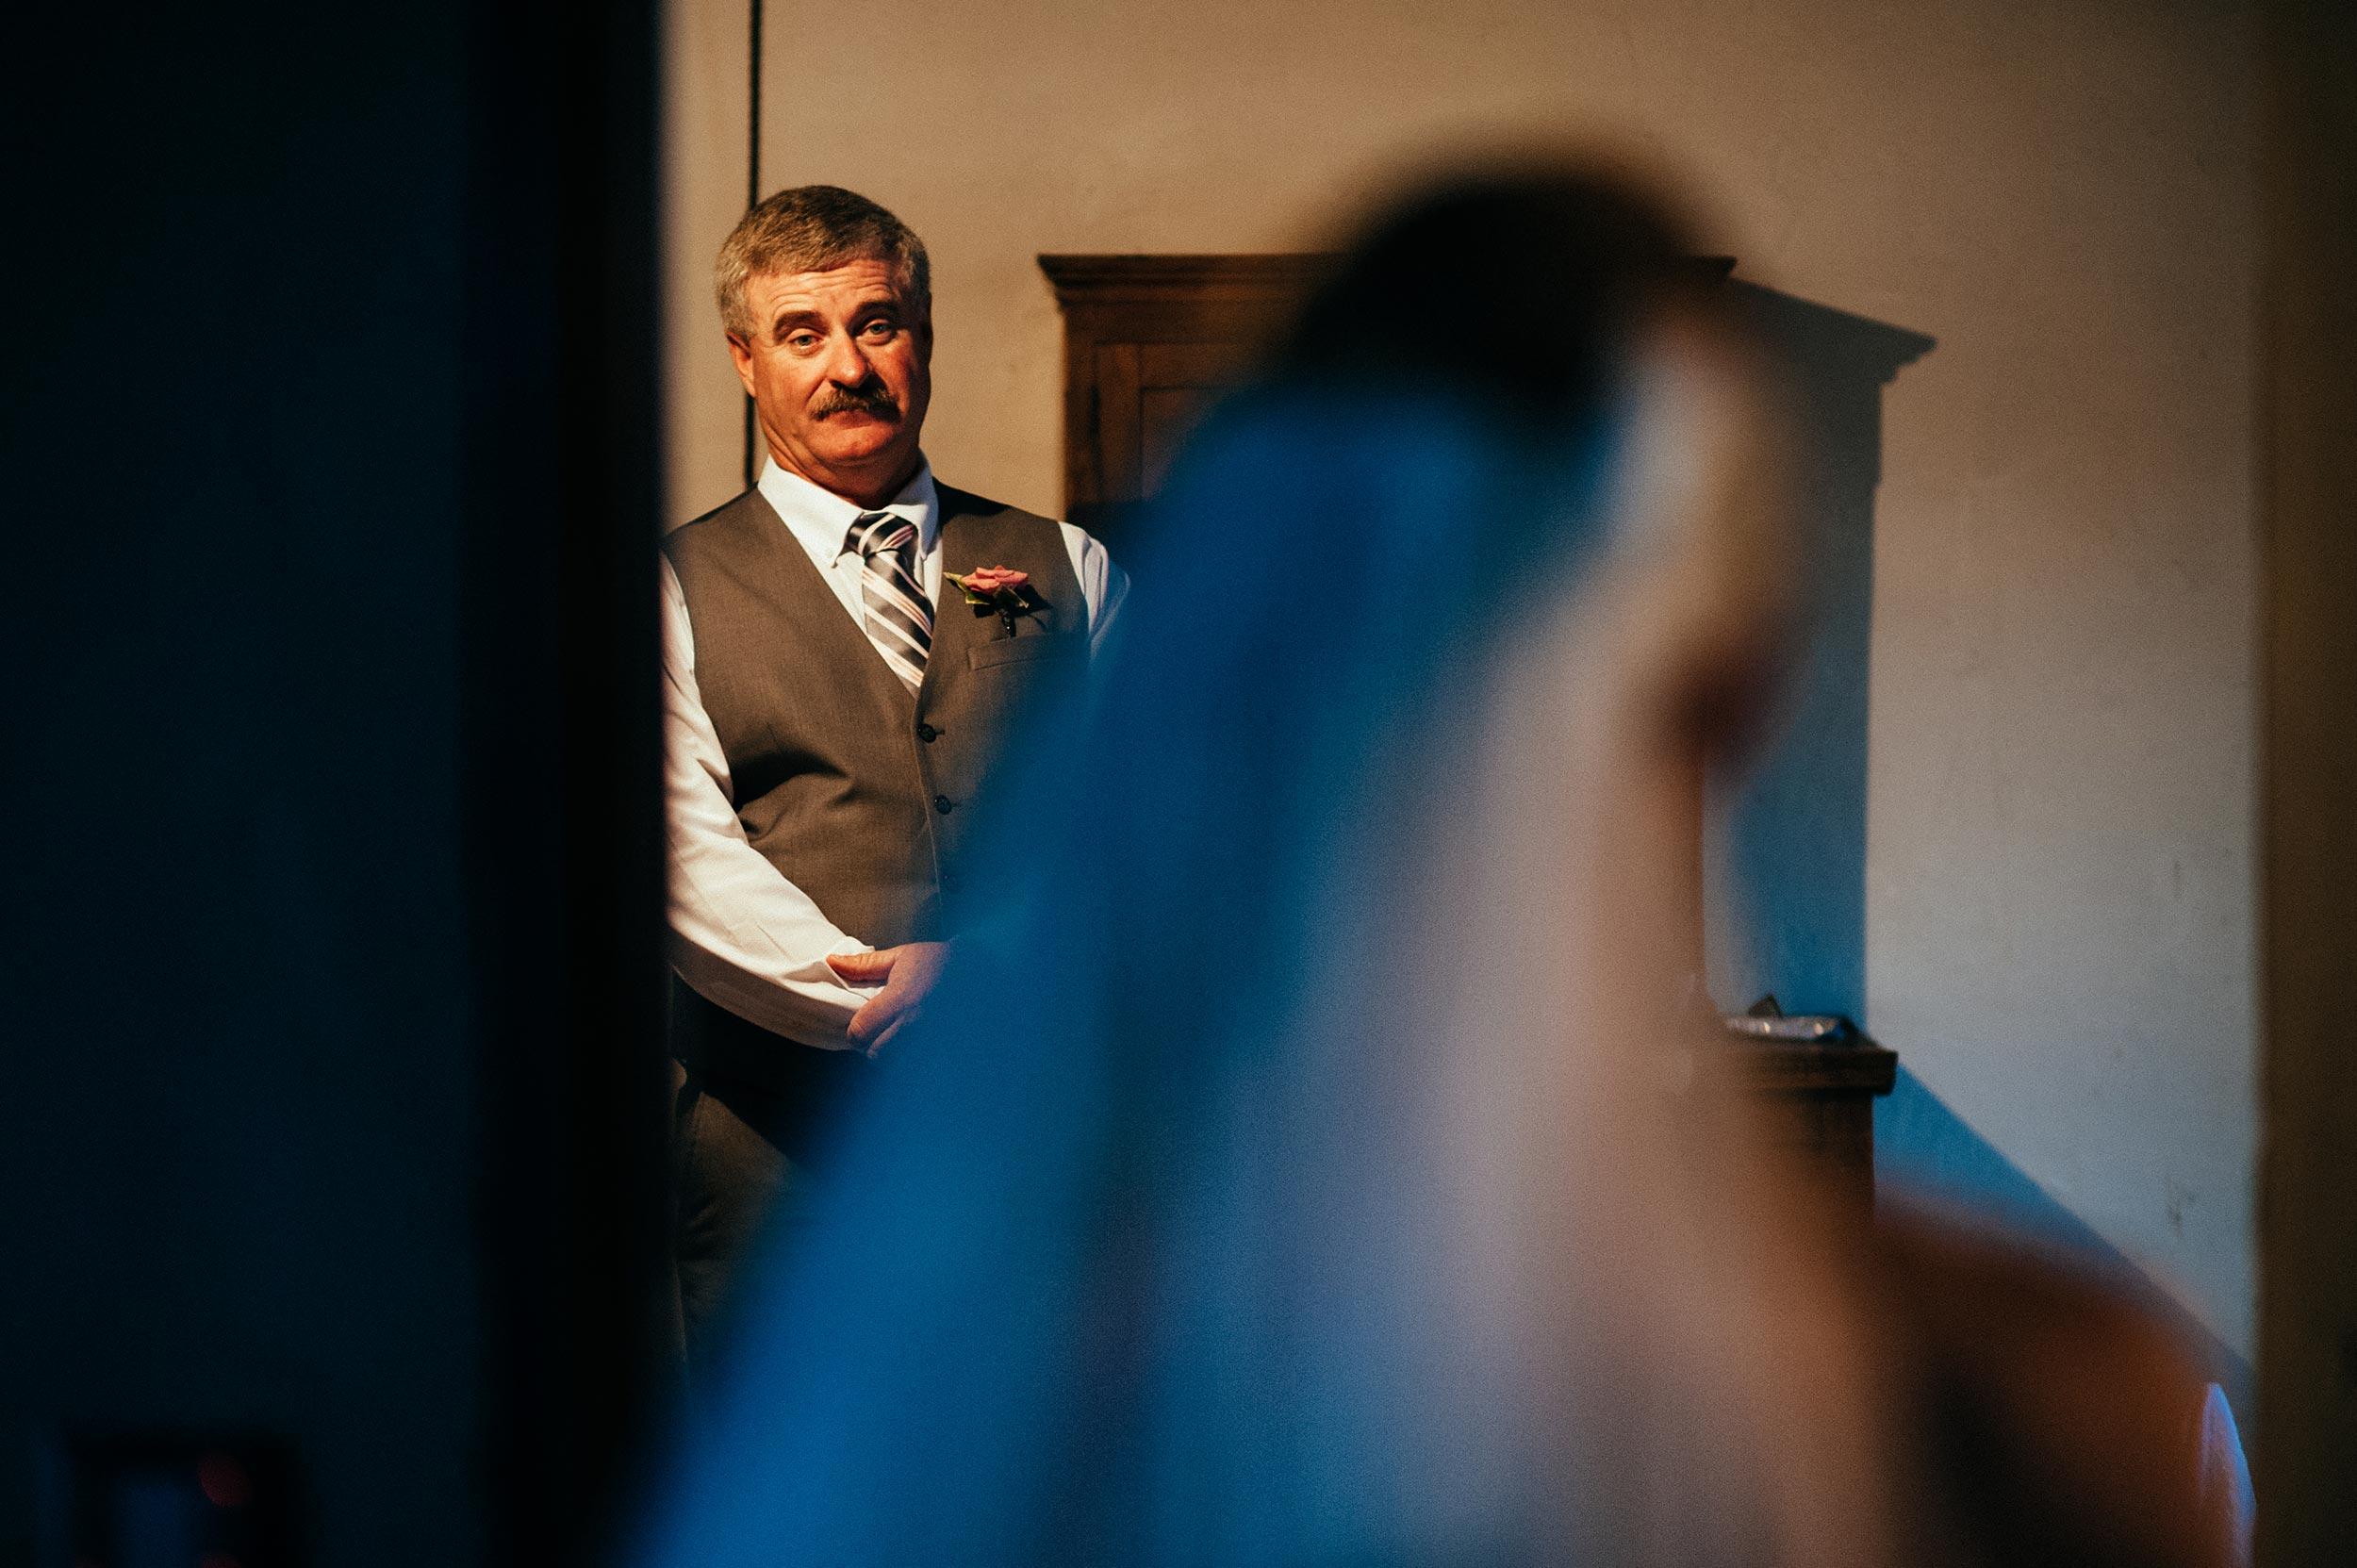 2014-Shelby-Jocelyn-Santo-Stefano-Di-Sessanio-Wedding-Photographer-Italy-Alessandro-Avenali-25.jpg